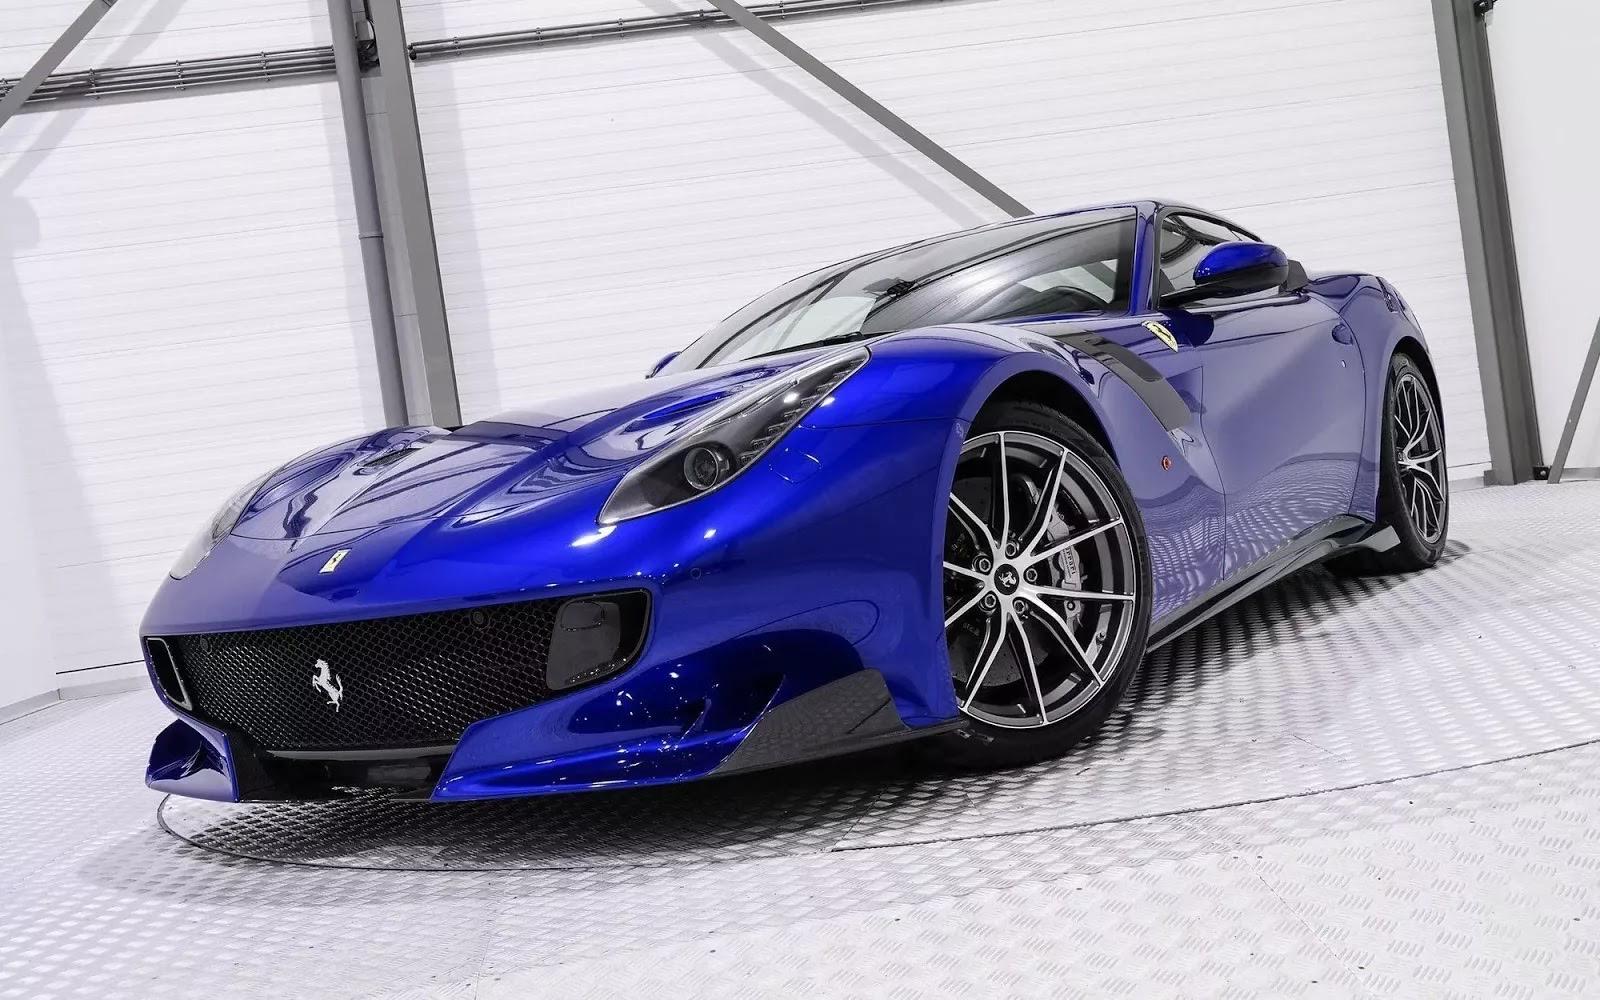 One-Off_Electric_Blue_Ferrari_F12tdf_08